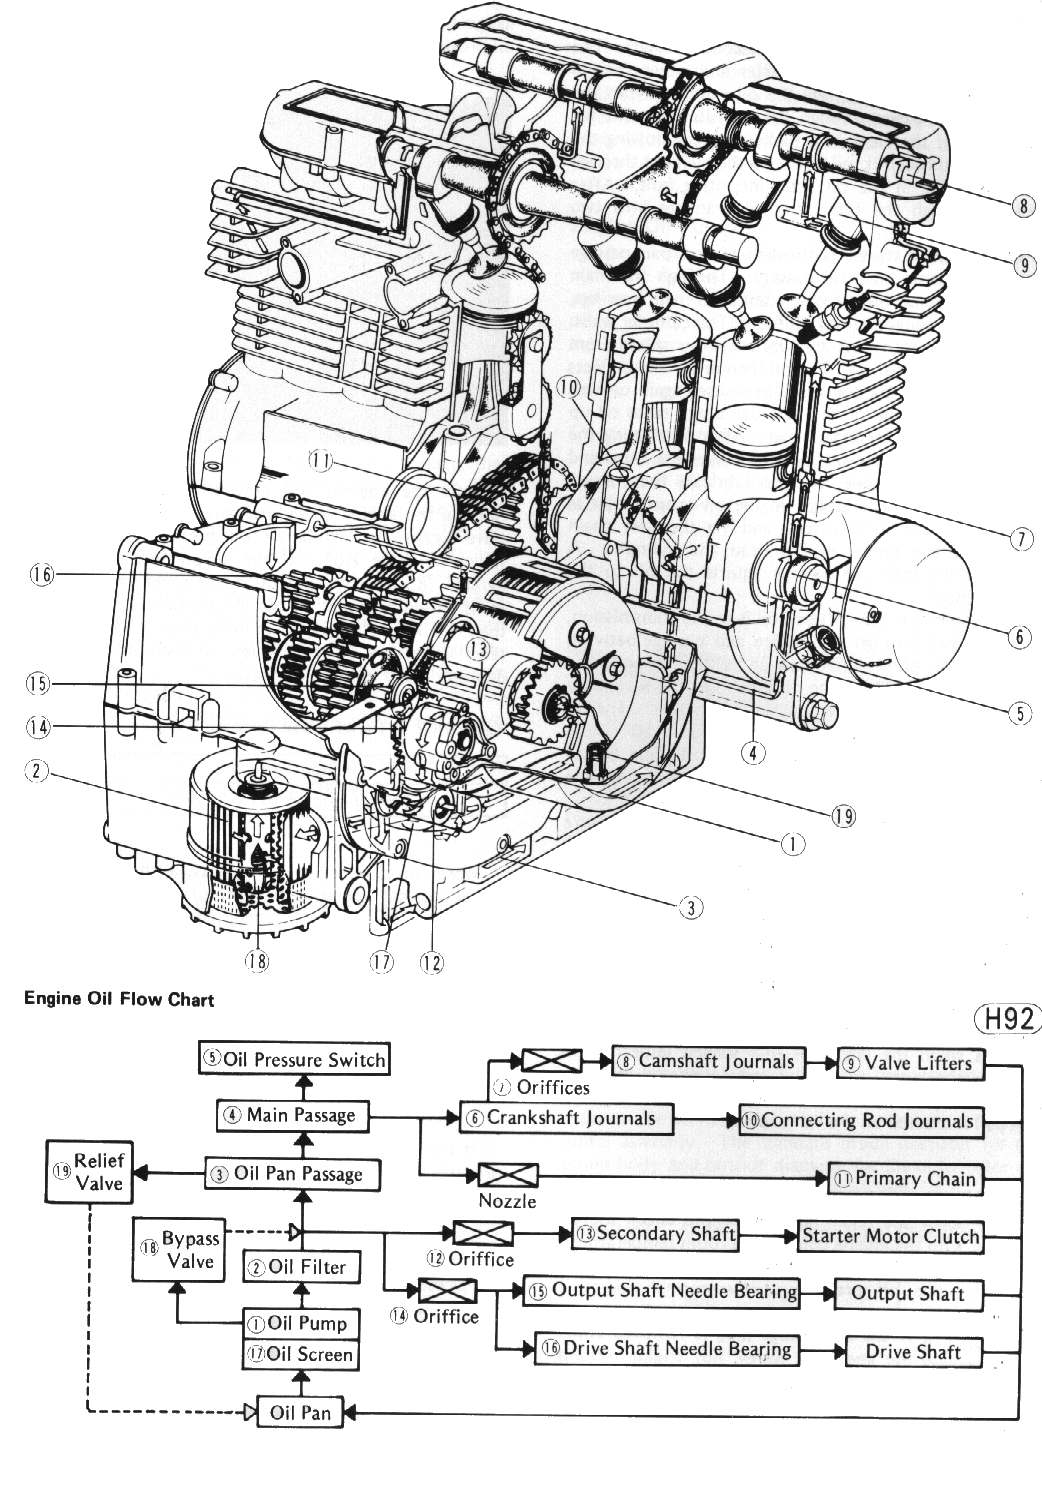 ecotec engine diagram oil pan wiring diagram photos for help your